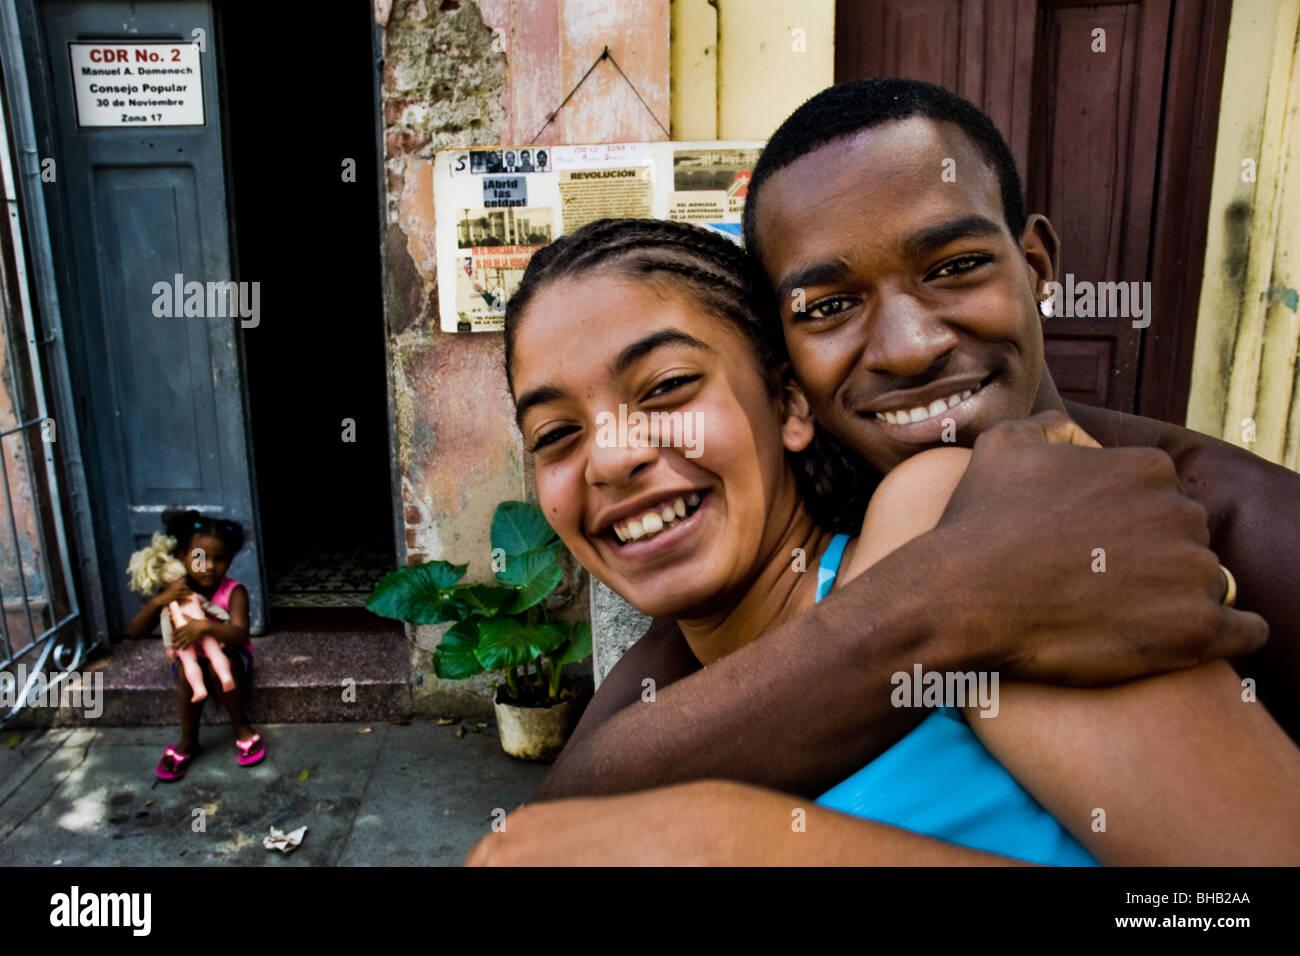 A young Cuban boy embracing a girl on the street of Santiago de Cuba, Cuba. - Stock Image